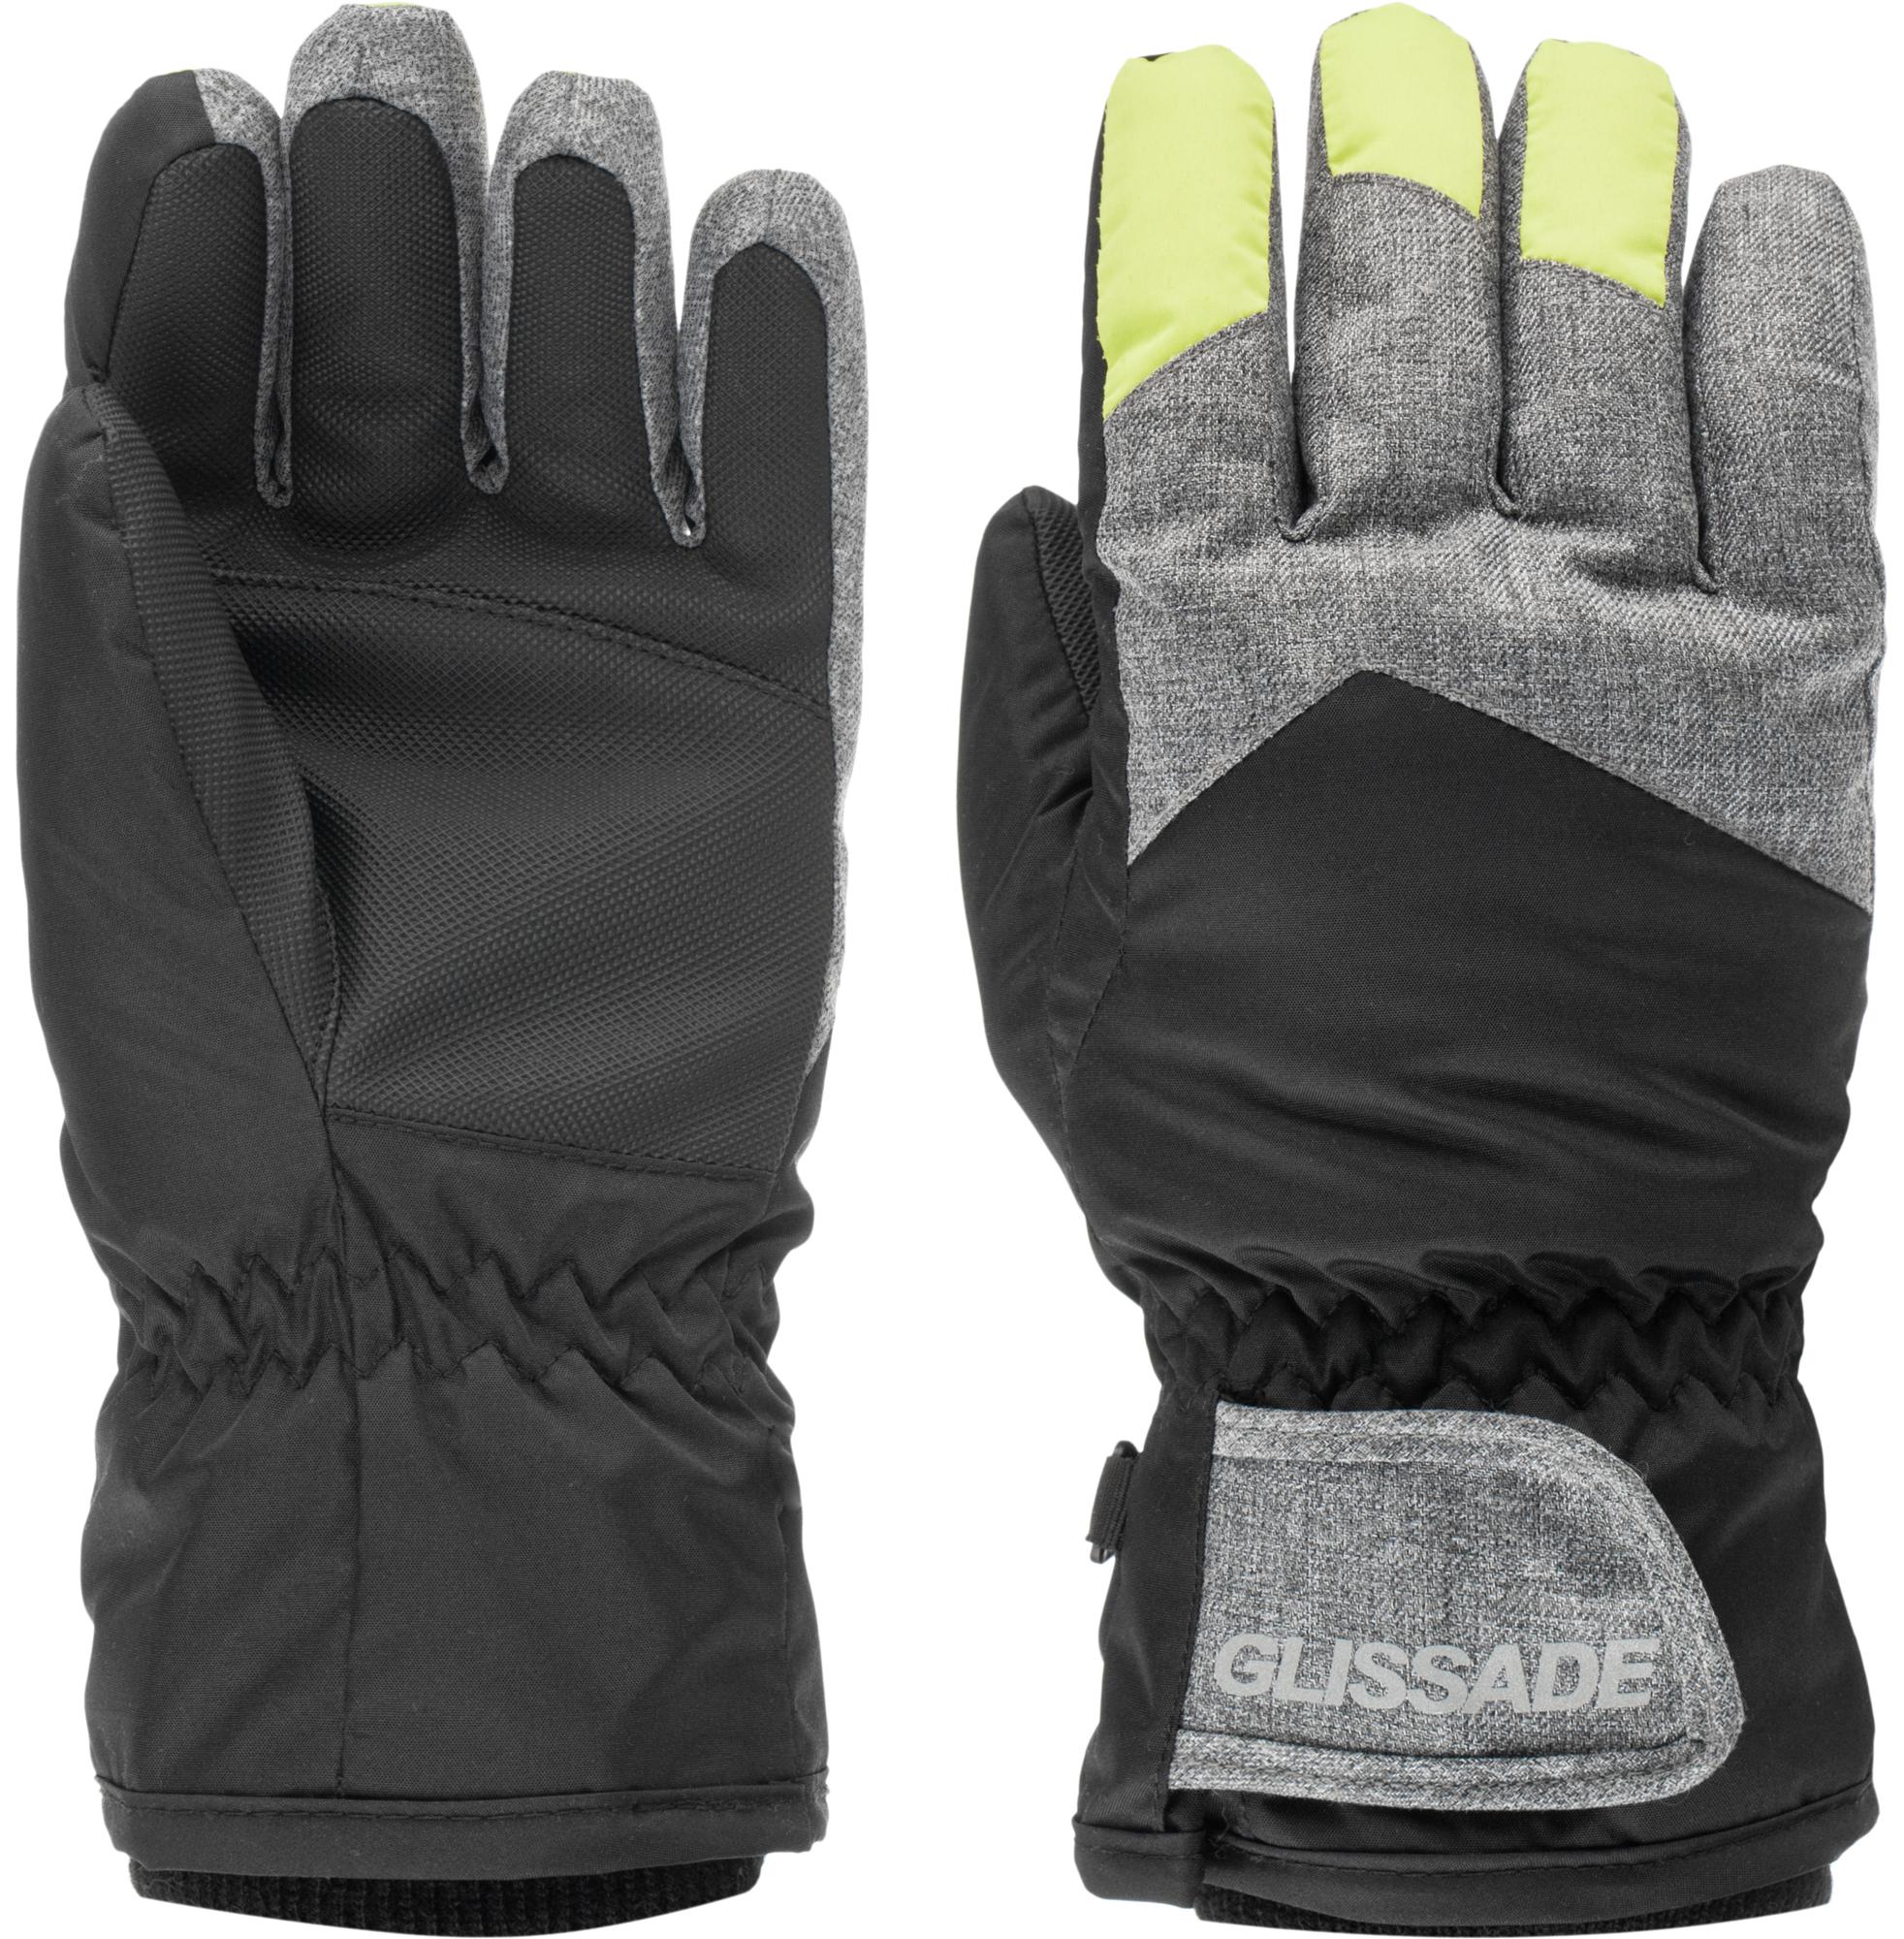 Glissade Перчатки для мальчиков Glissade, размер 5